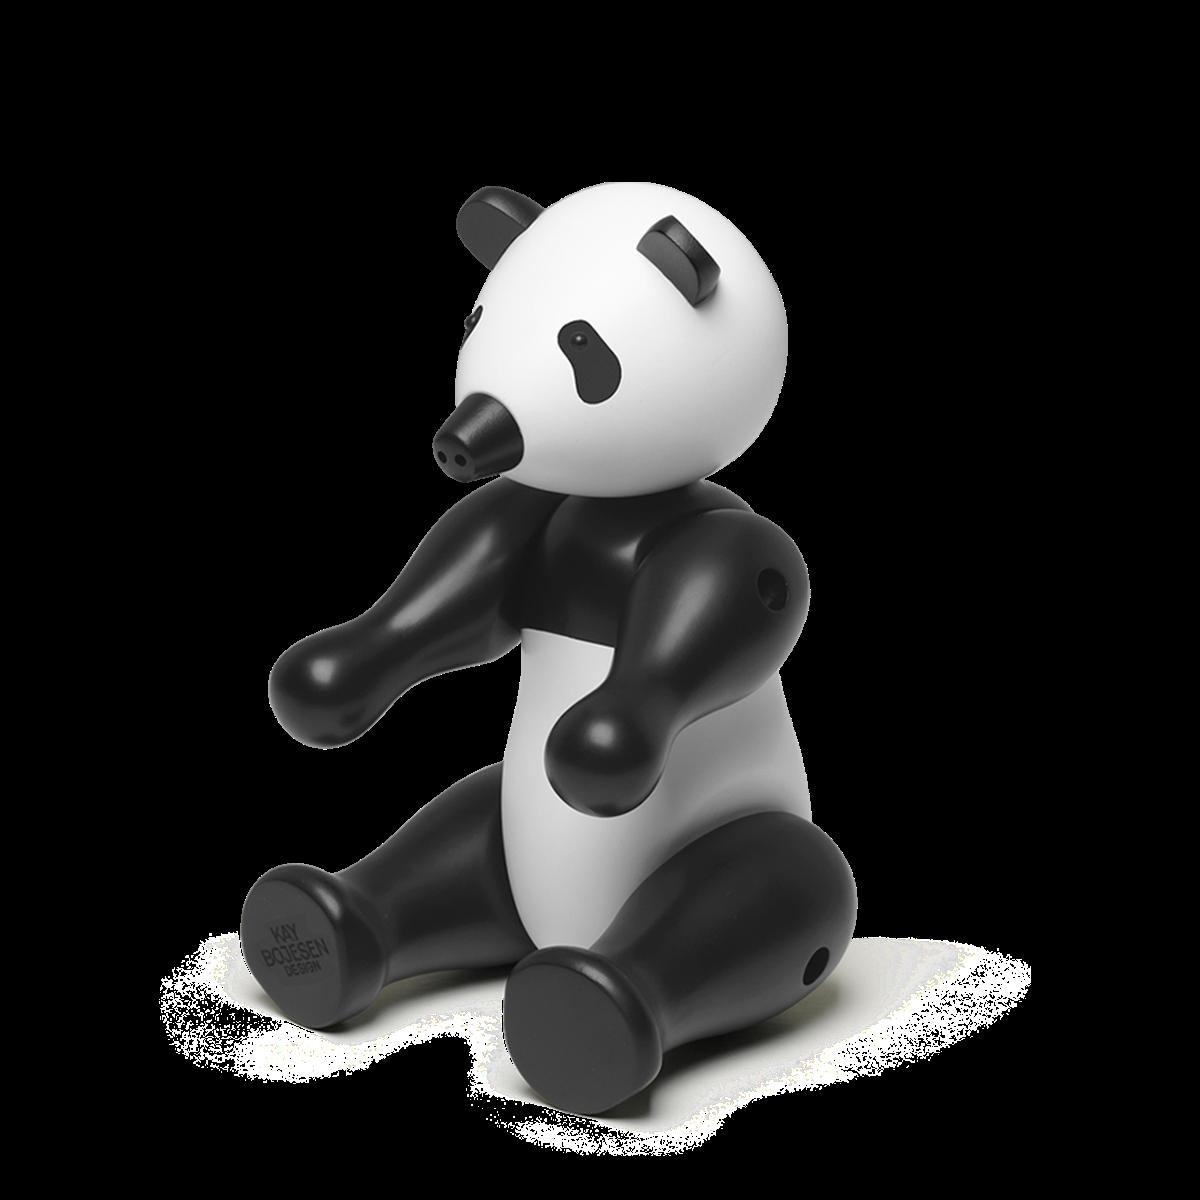 Kay Bojesen - Pandabjørn Medium (39422)